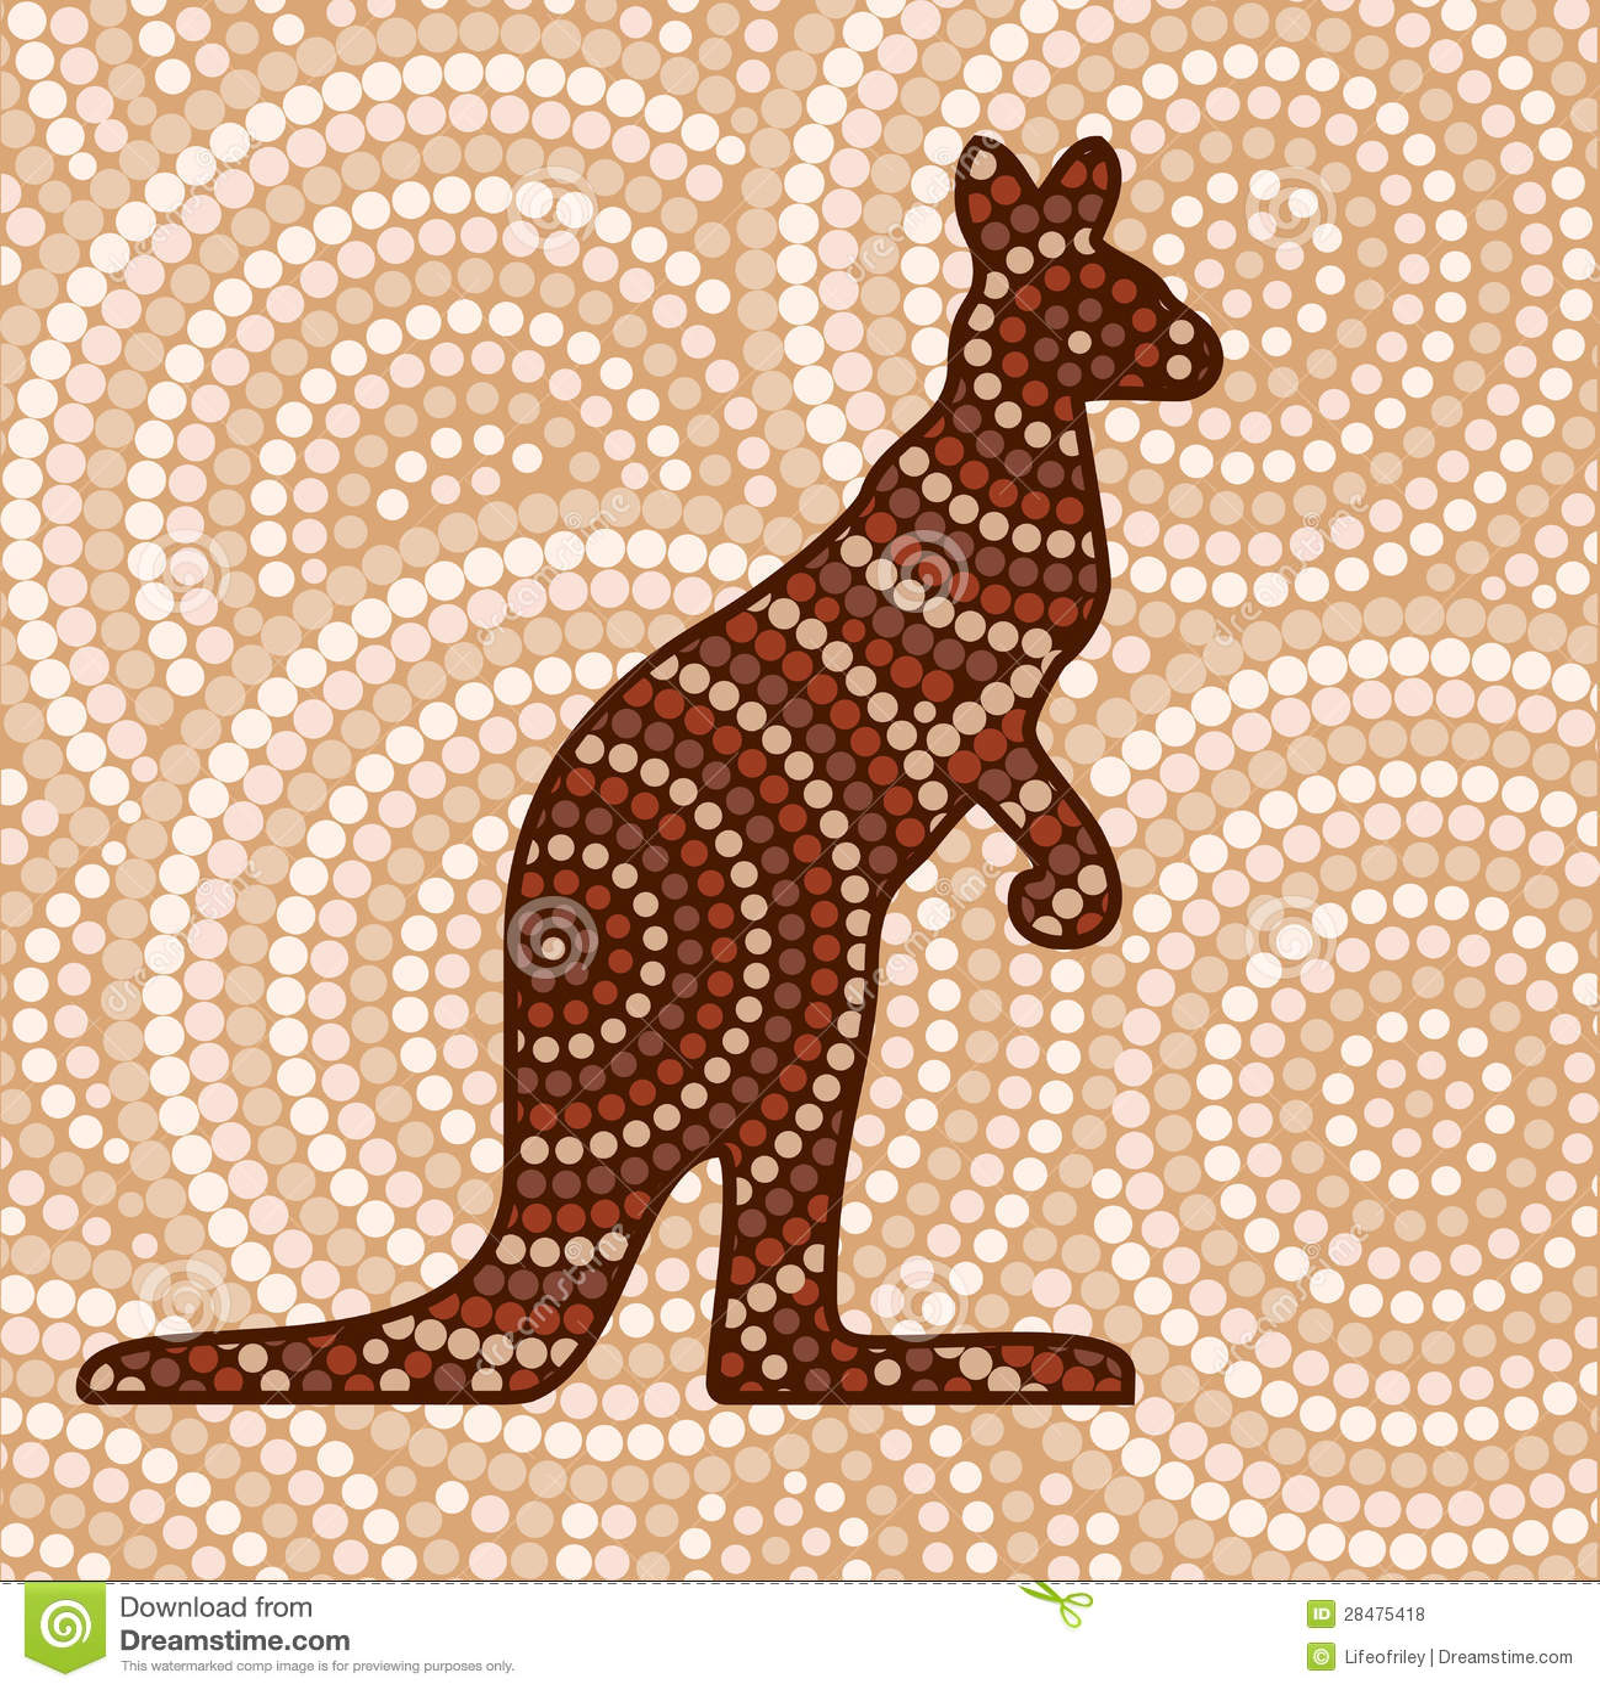 Abstract Aboriginal Art Royalty Free Stock Photos Image 28475418